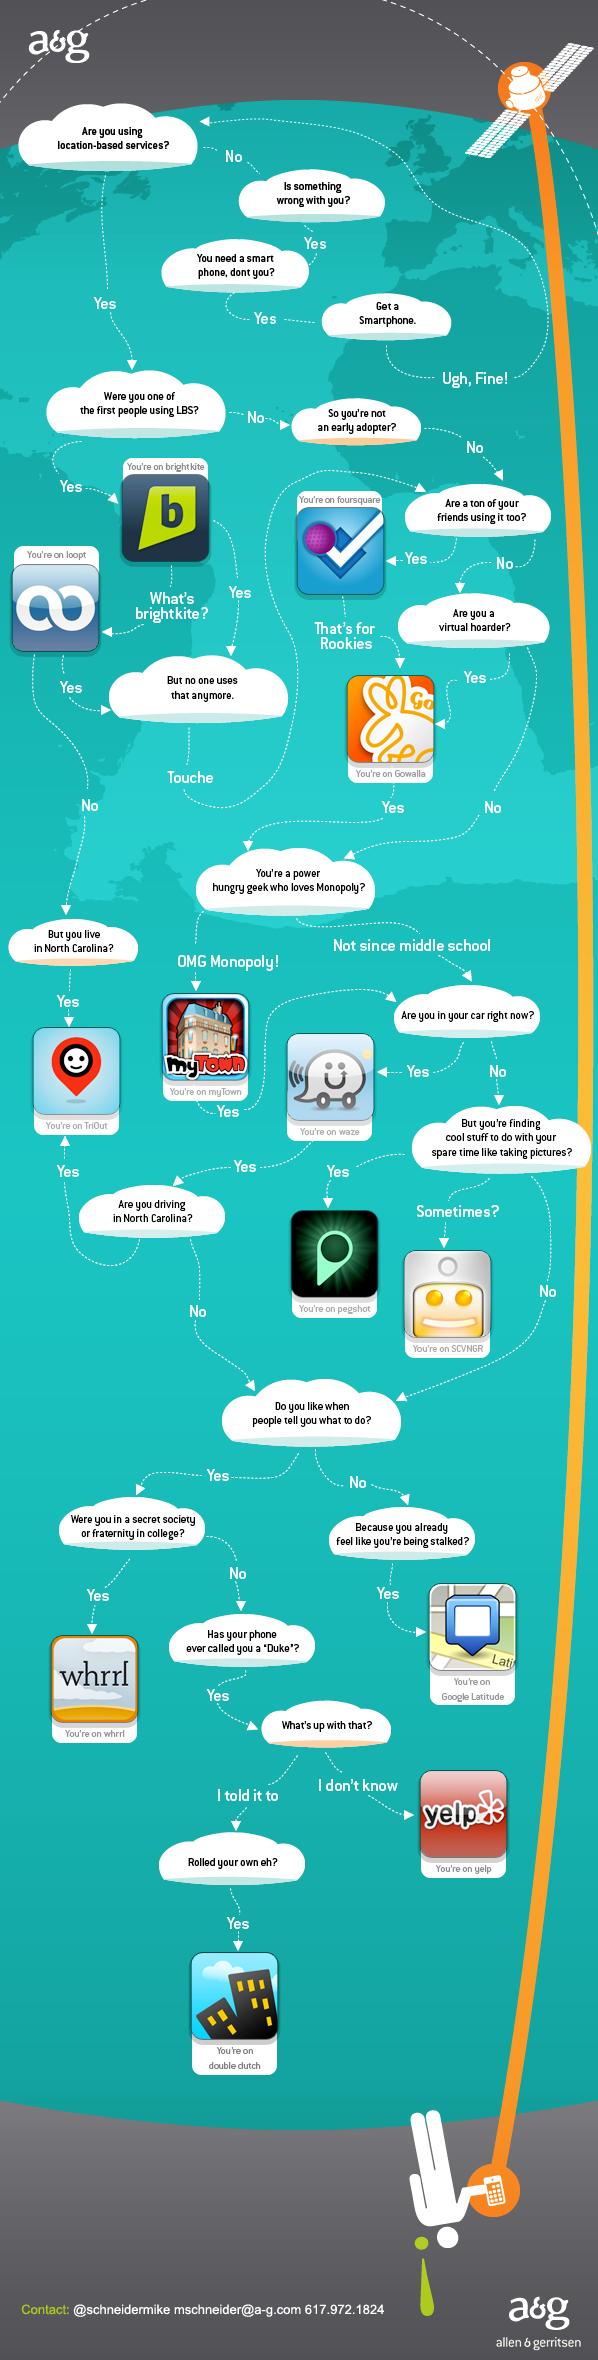 Lbs_infographic2